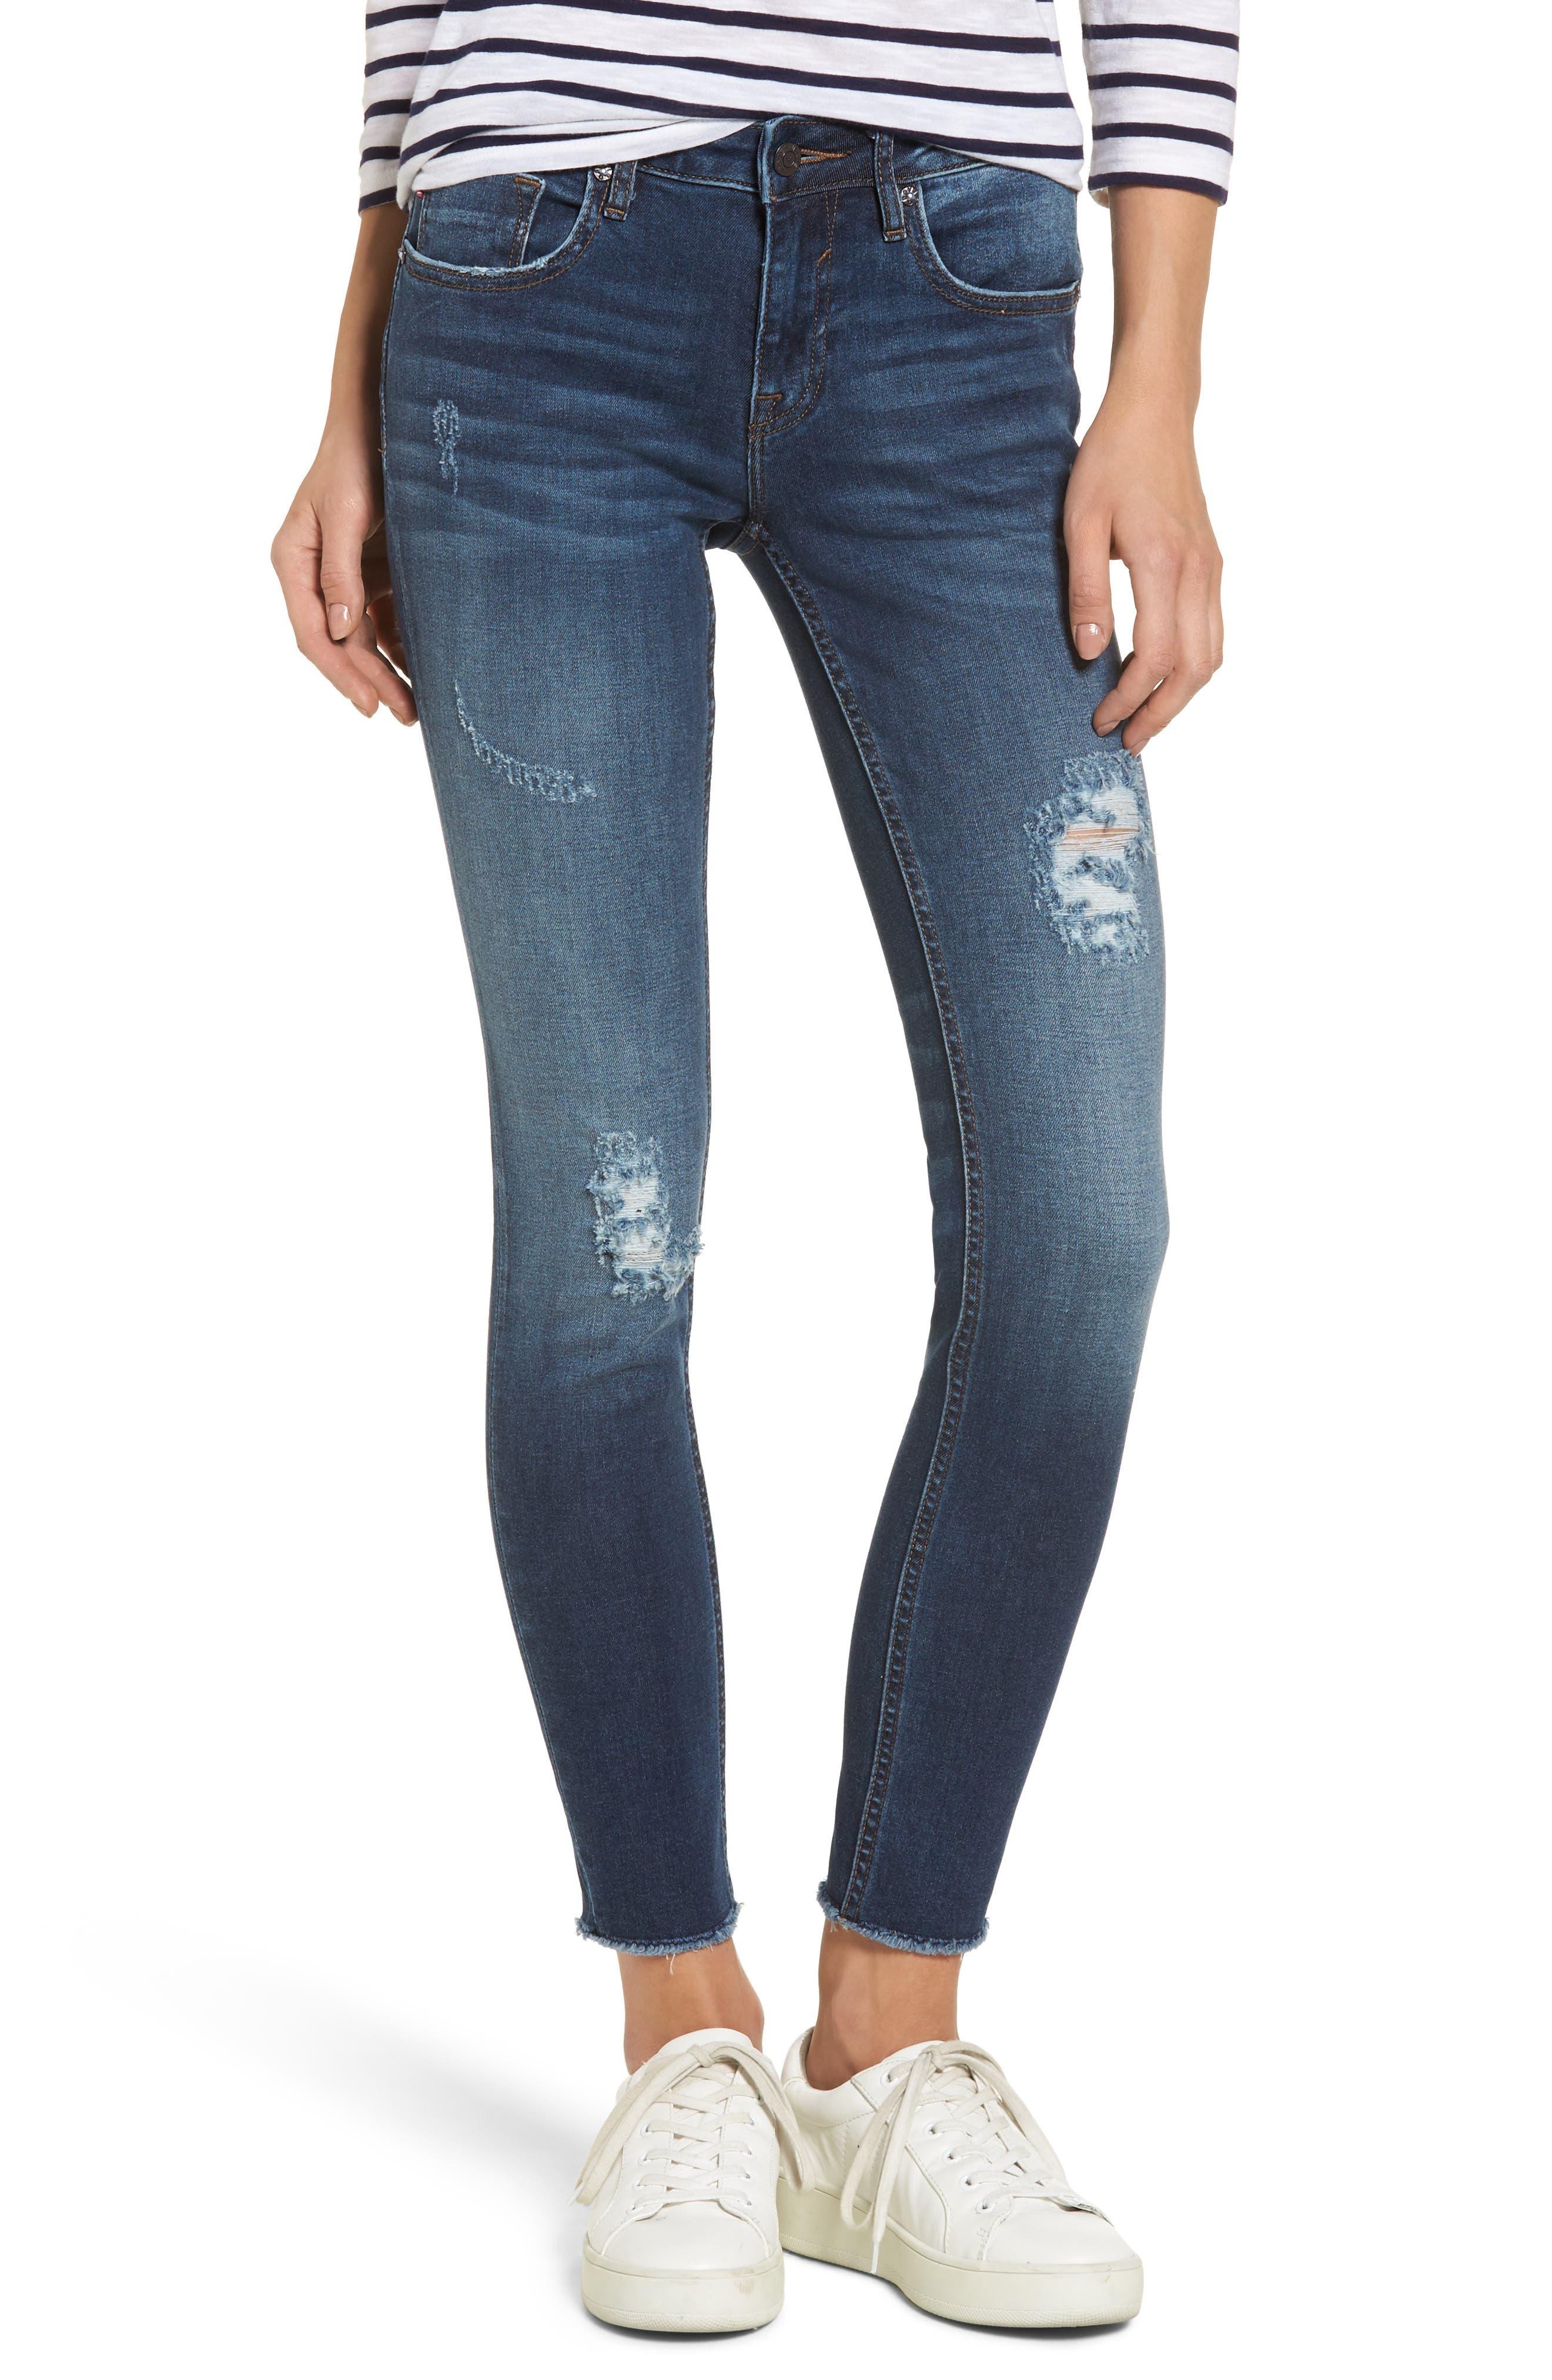 Jagger Distressed Skinny Jeans,                         Main,                         color, Dark Wash